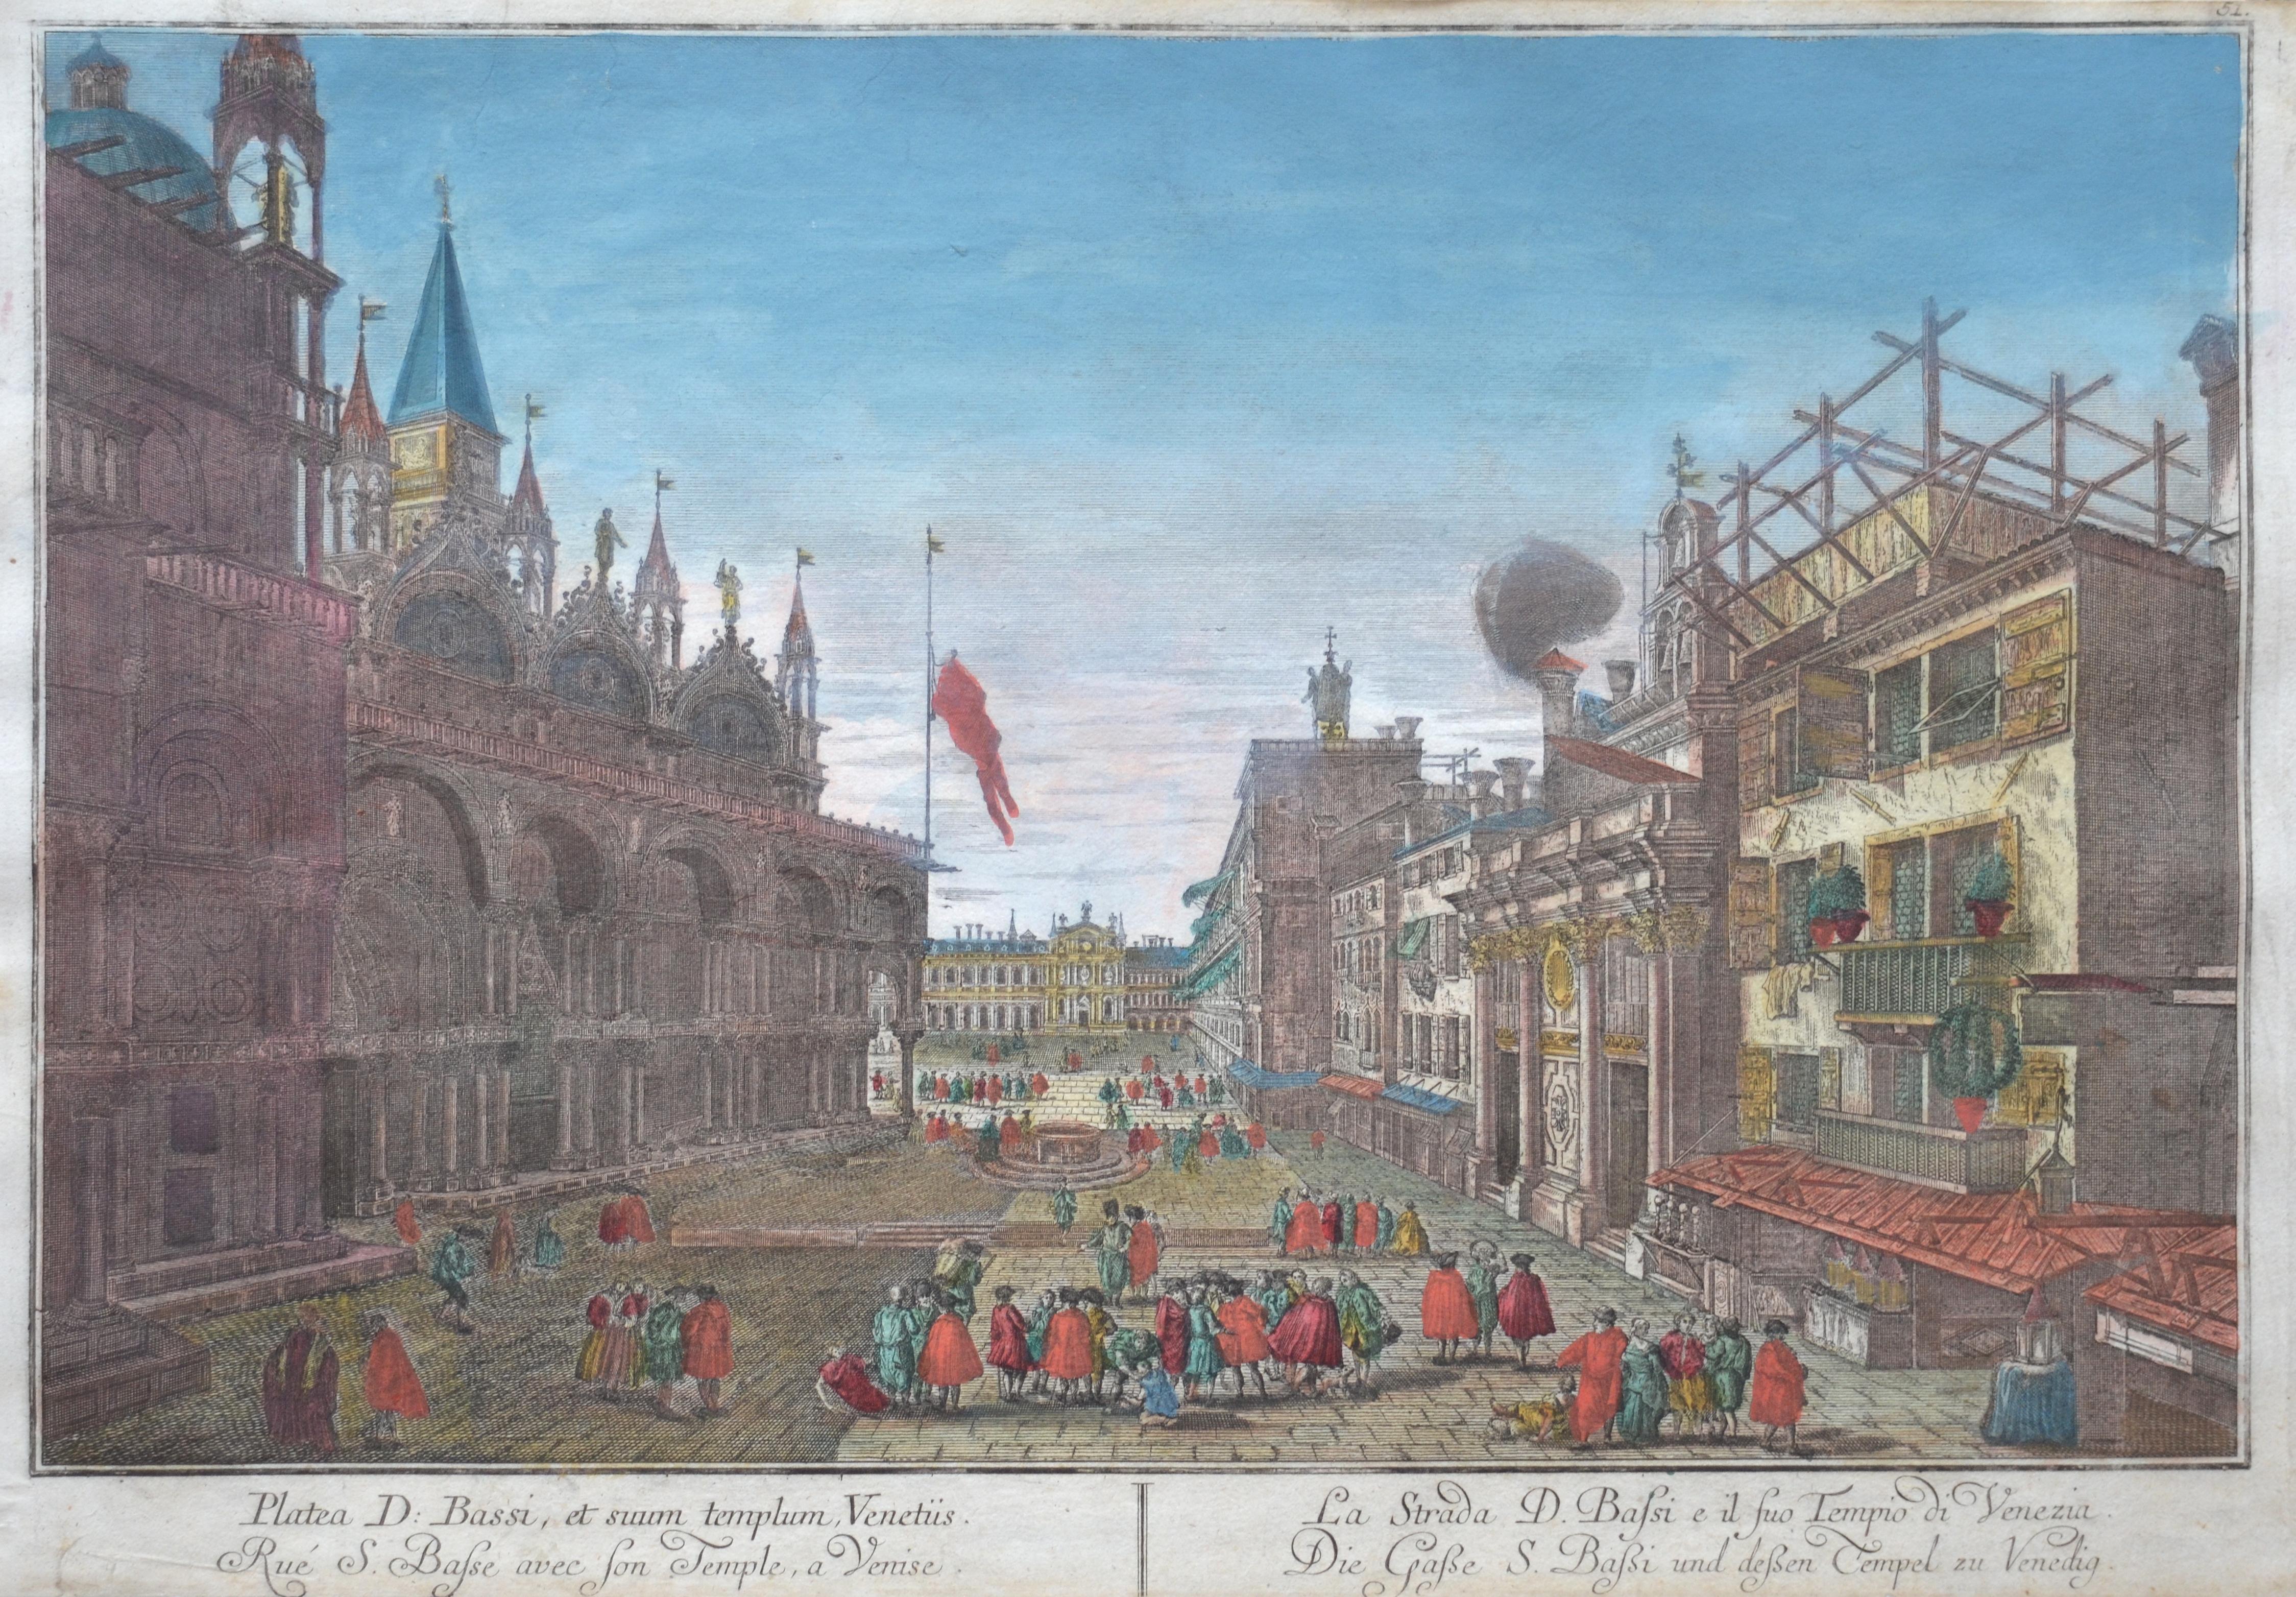 Probst Johann Friedrich La Strada d. Bassi e il suo Tempio di Venecia/ Die Gasse S.Baßi und deßen Tempel zu Venedig